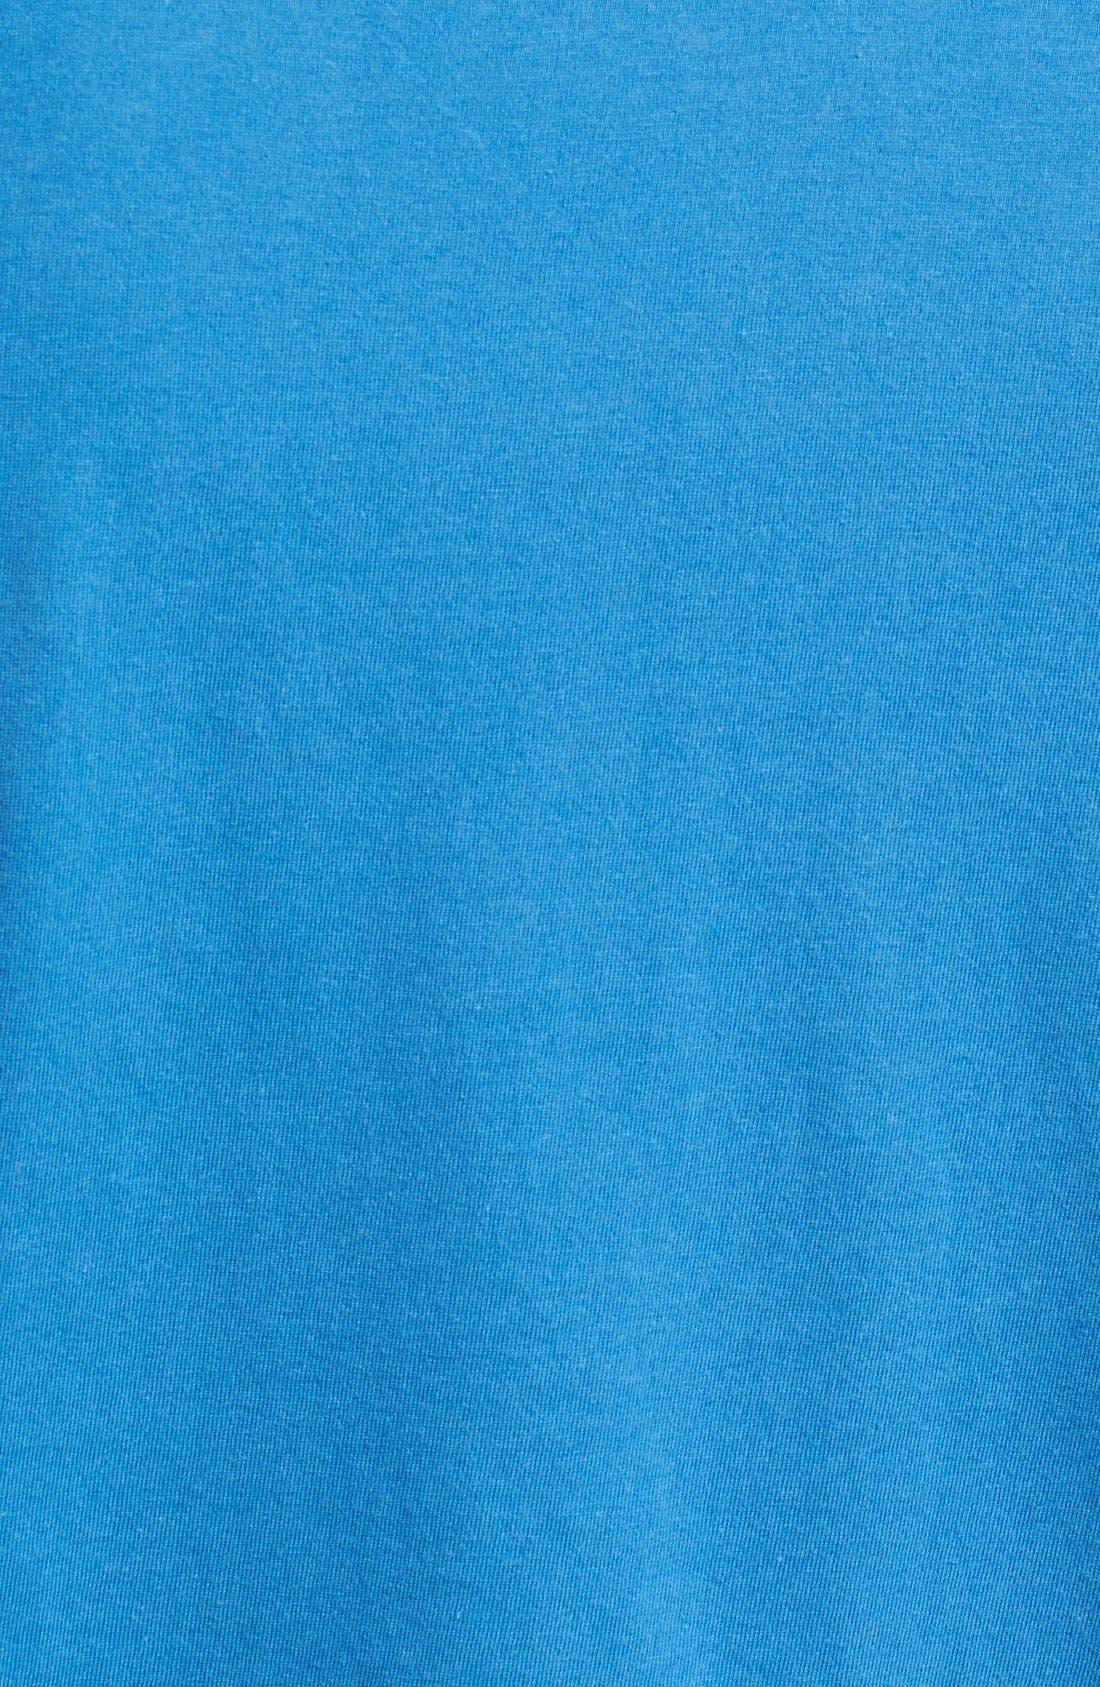 Alternate Image 3  - Red Jacket 'Toronto Maple Leafs' T-Shirt (Men)